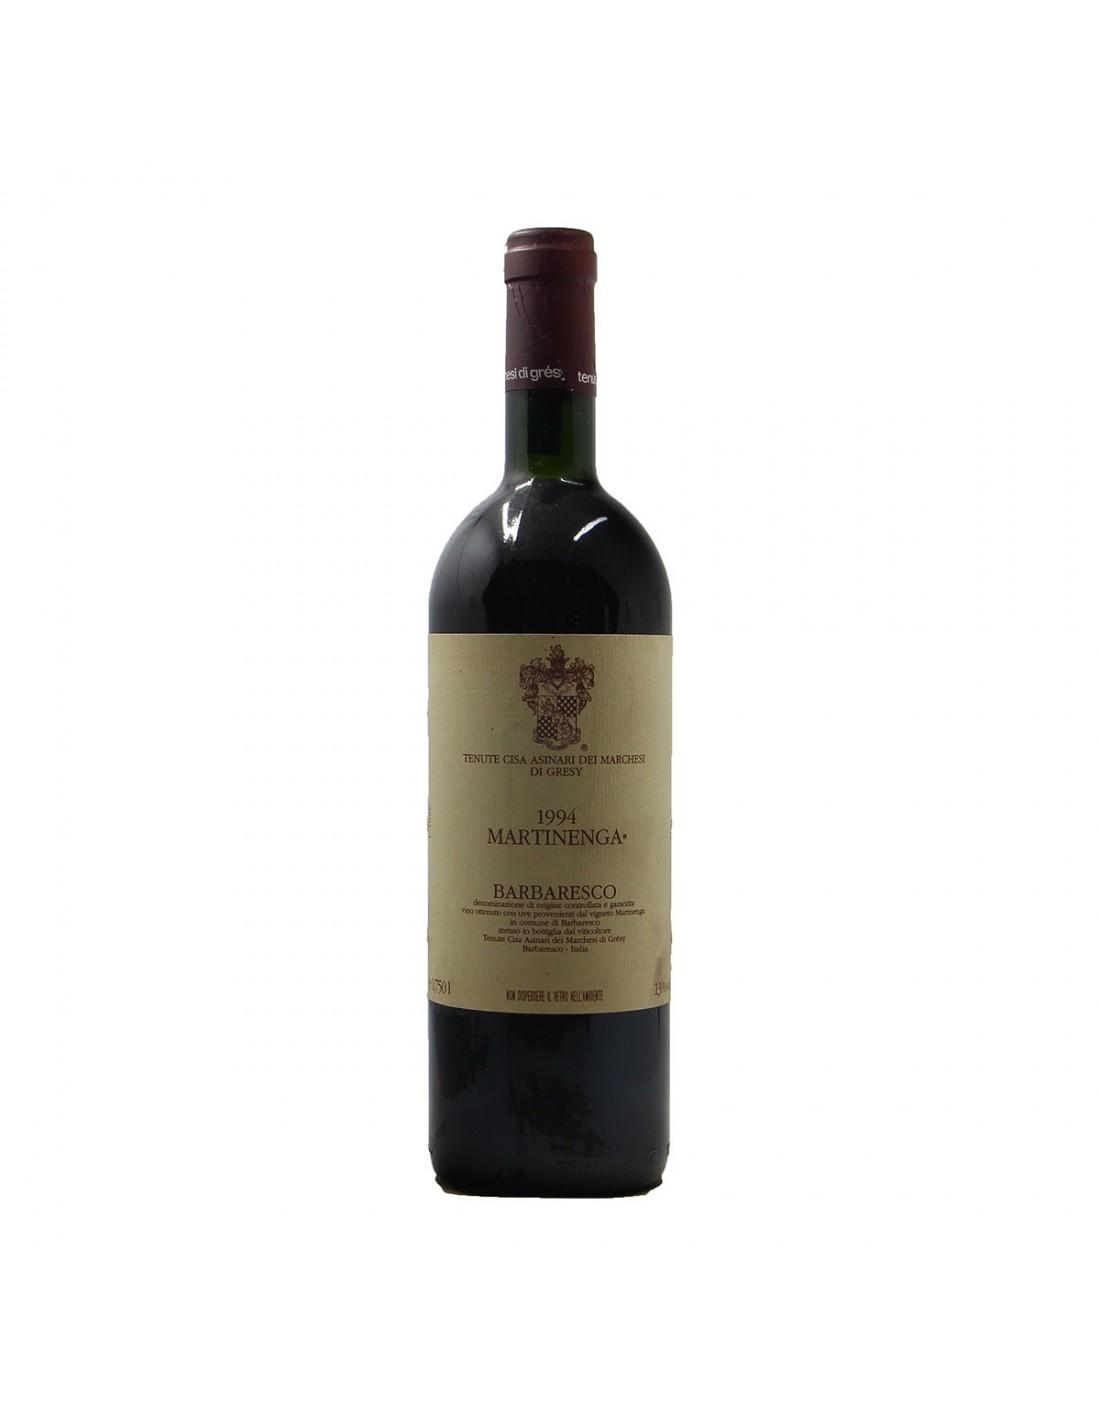 BARBARESCO MARTINENGA 1994 MARCHESI DI GRESY Grandi Bottiglie